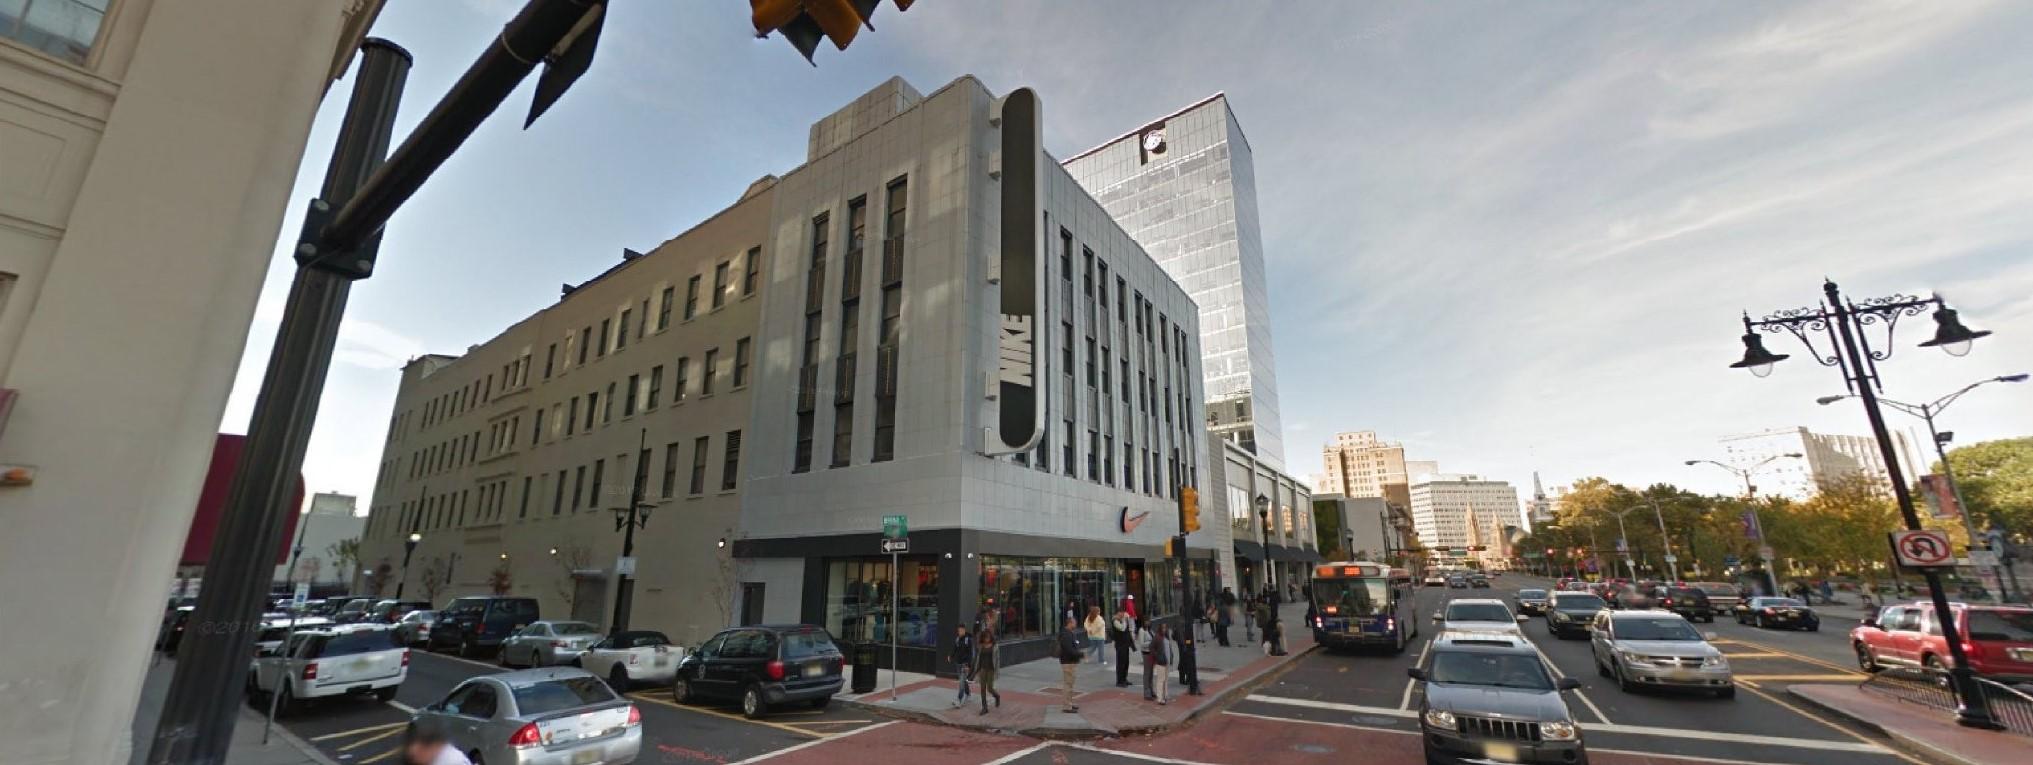 Riego fiabilidad Doctrina  nke-nike-factory-store-697-broad-street-newark-nj-5-https___www-google |  Architecture + Branding